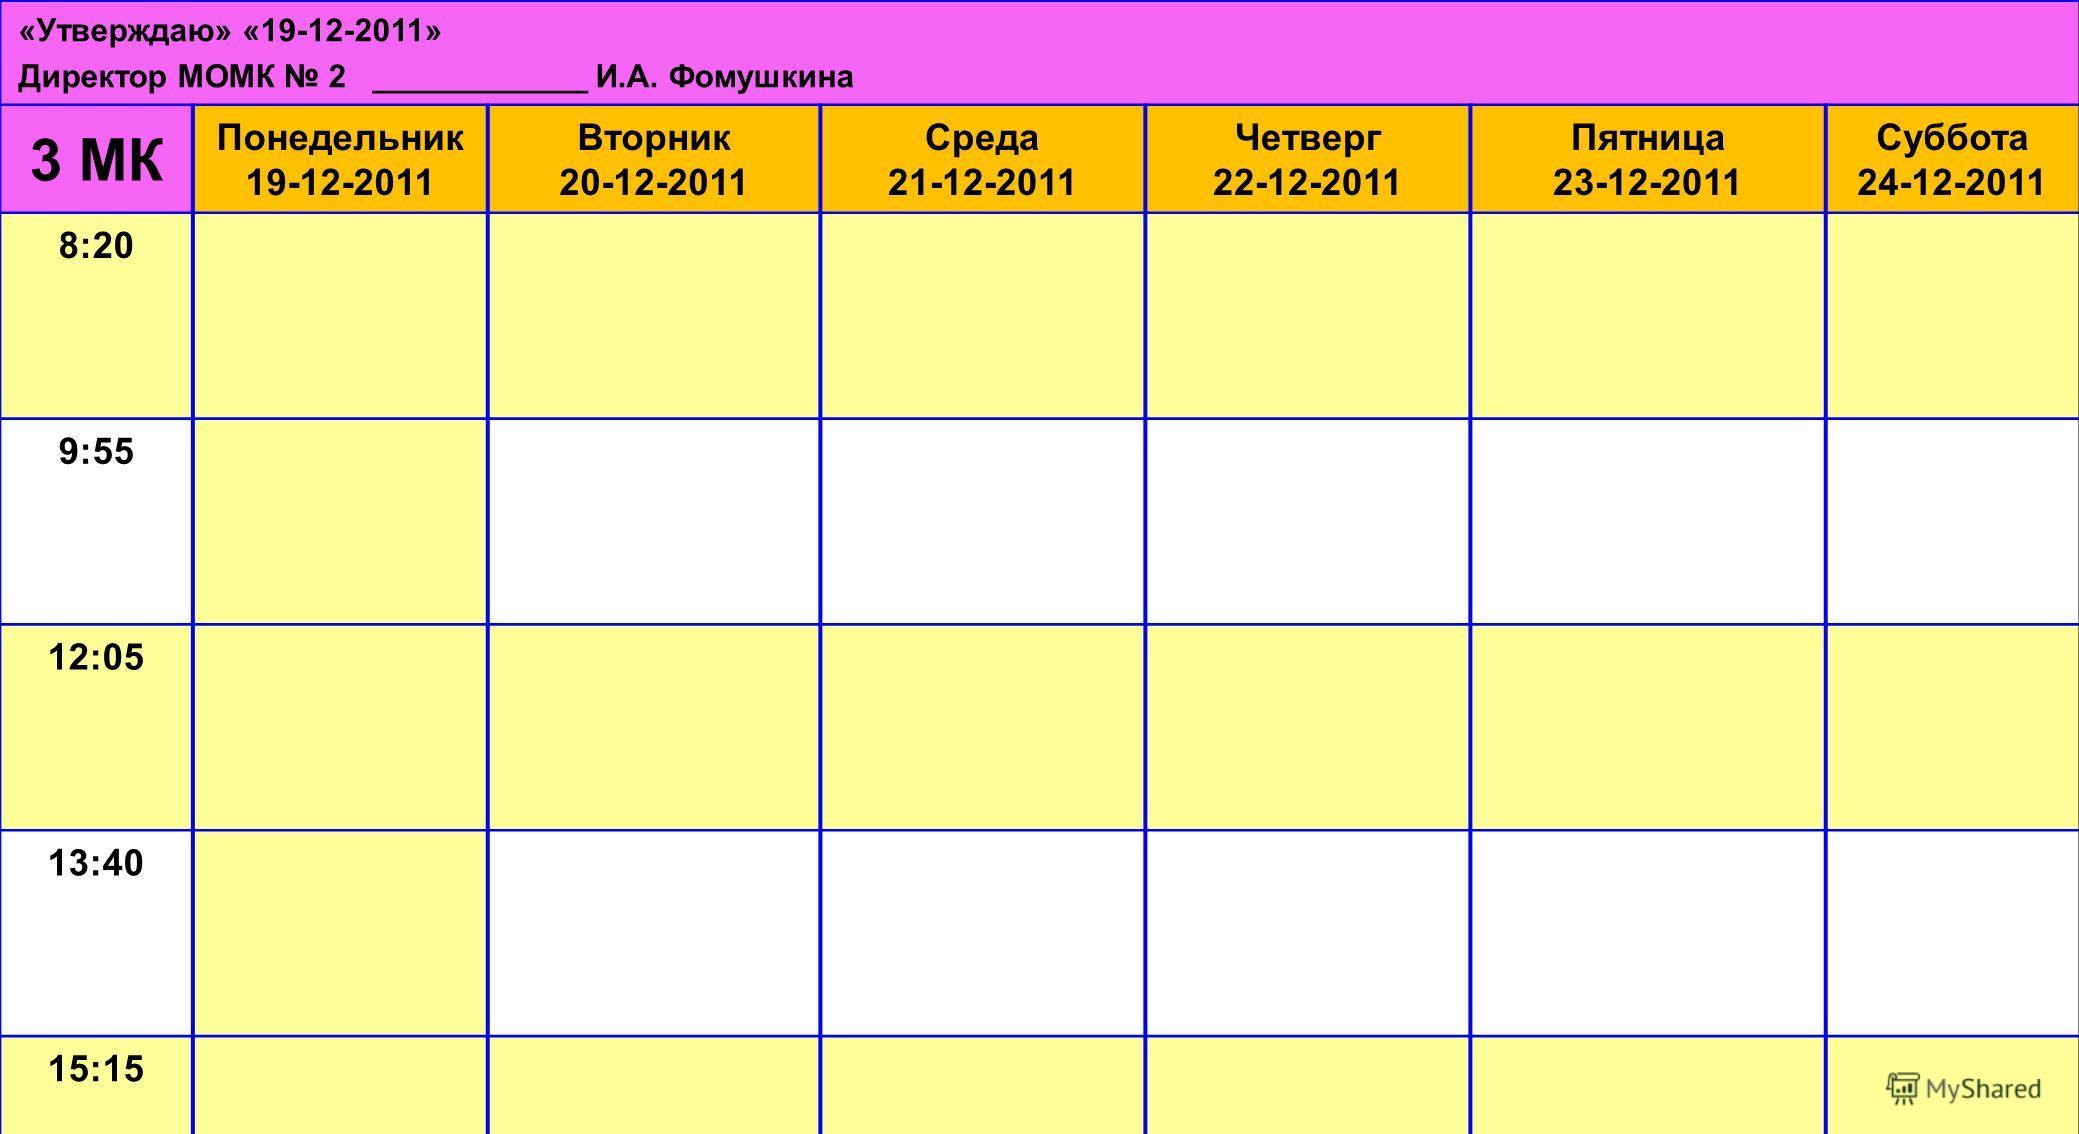 «Утверждаю» «19-12-2011» Директор МОМК 2 ____________ И.А. Фомушкина 3 МК Понедельник 19-12-2011 Вторник 20-12-2011 Среда 21-12-2011 Четверг 22-12-2011 Пятница 23-12-2011 Суббота 24-12-2011 8:20 9:55 12:05 13:40 15:15